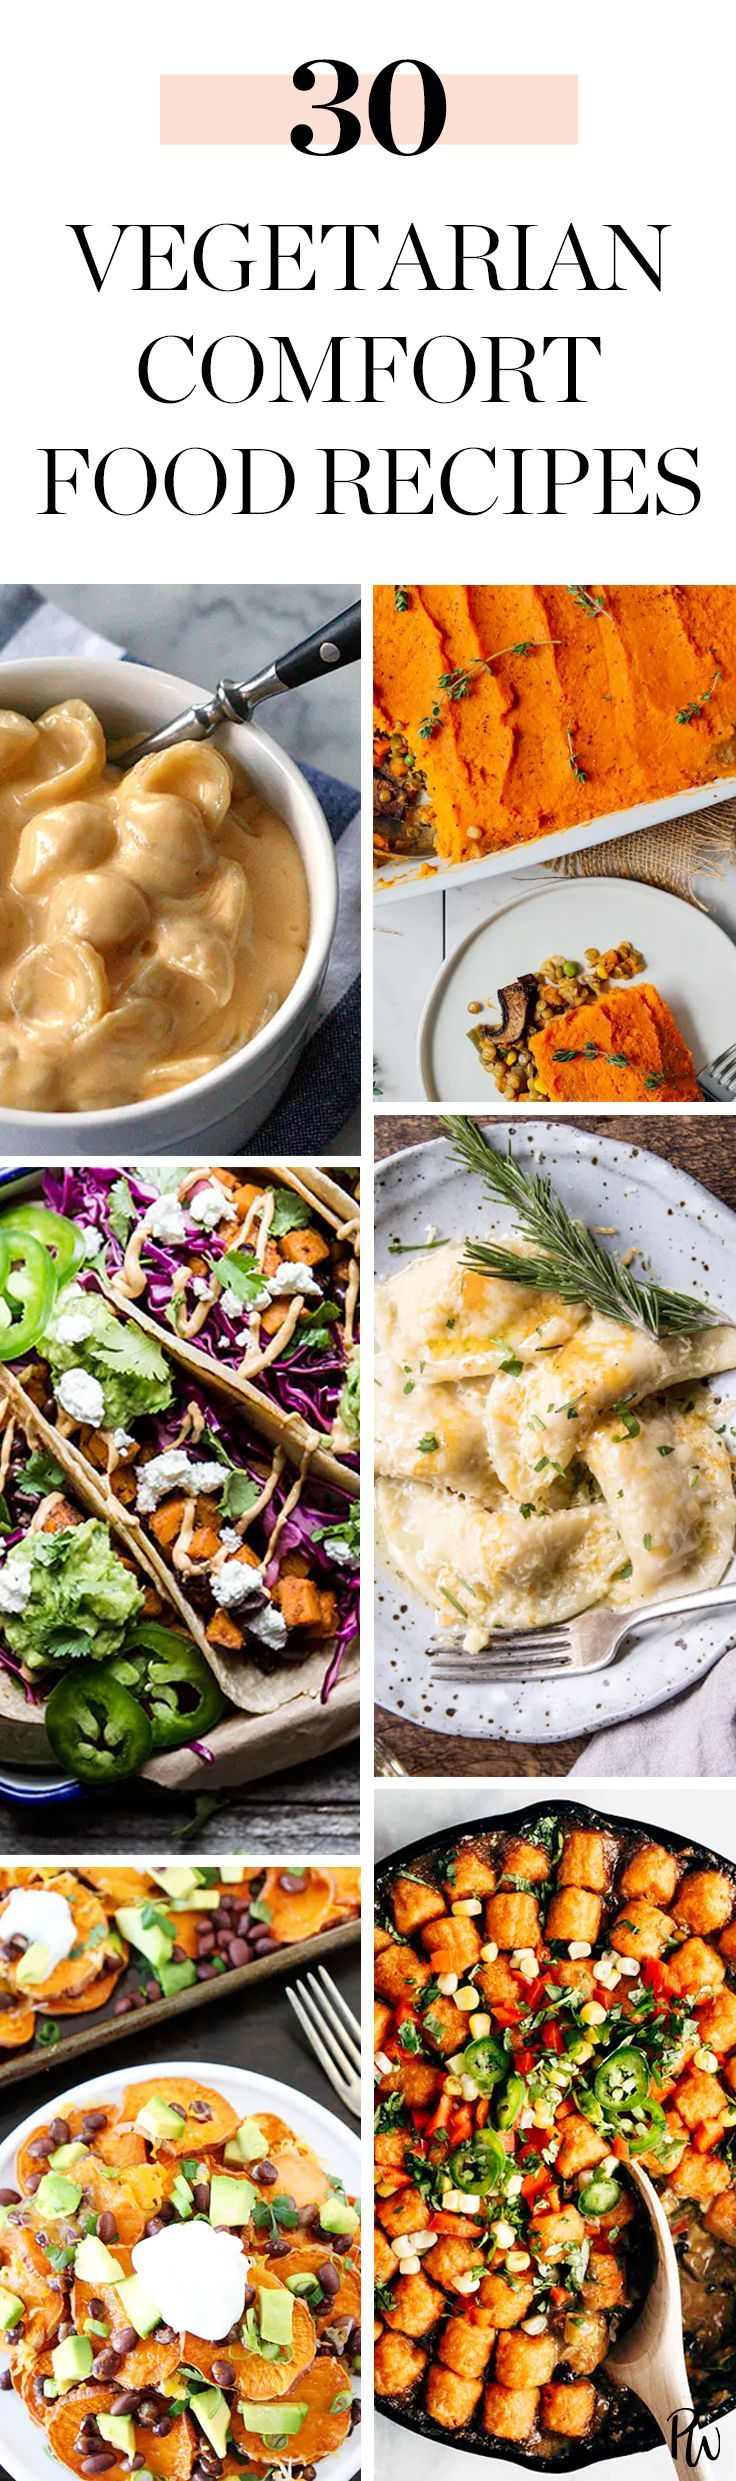 Get the best vegetarian comfort food recipes here. #vegetarian #comfortfood #sweetpotato #veggies #vegetarianappetizers